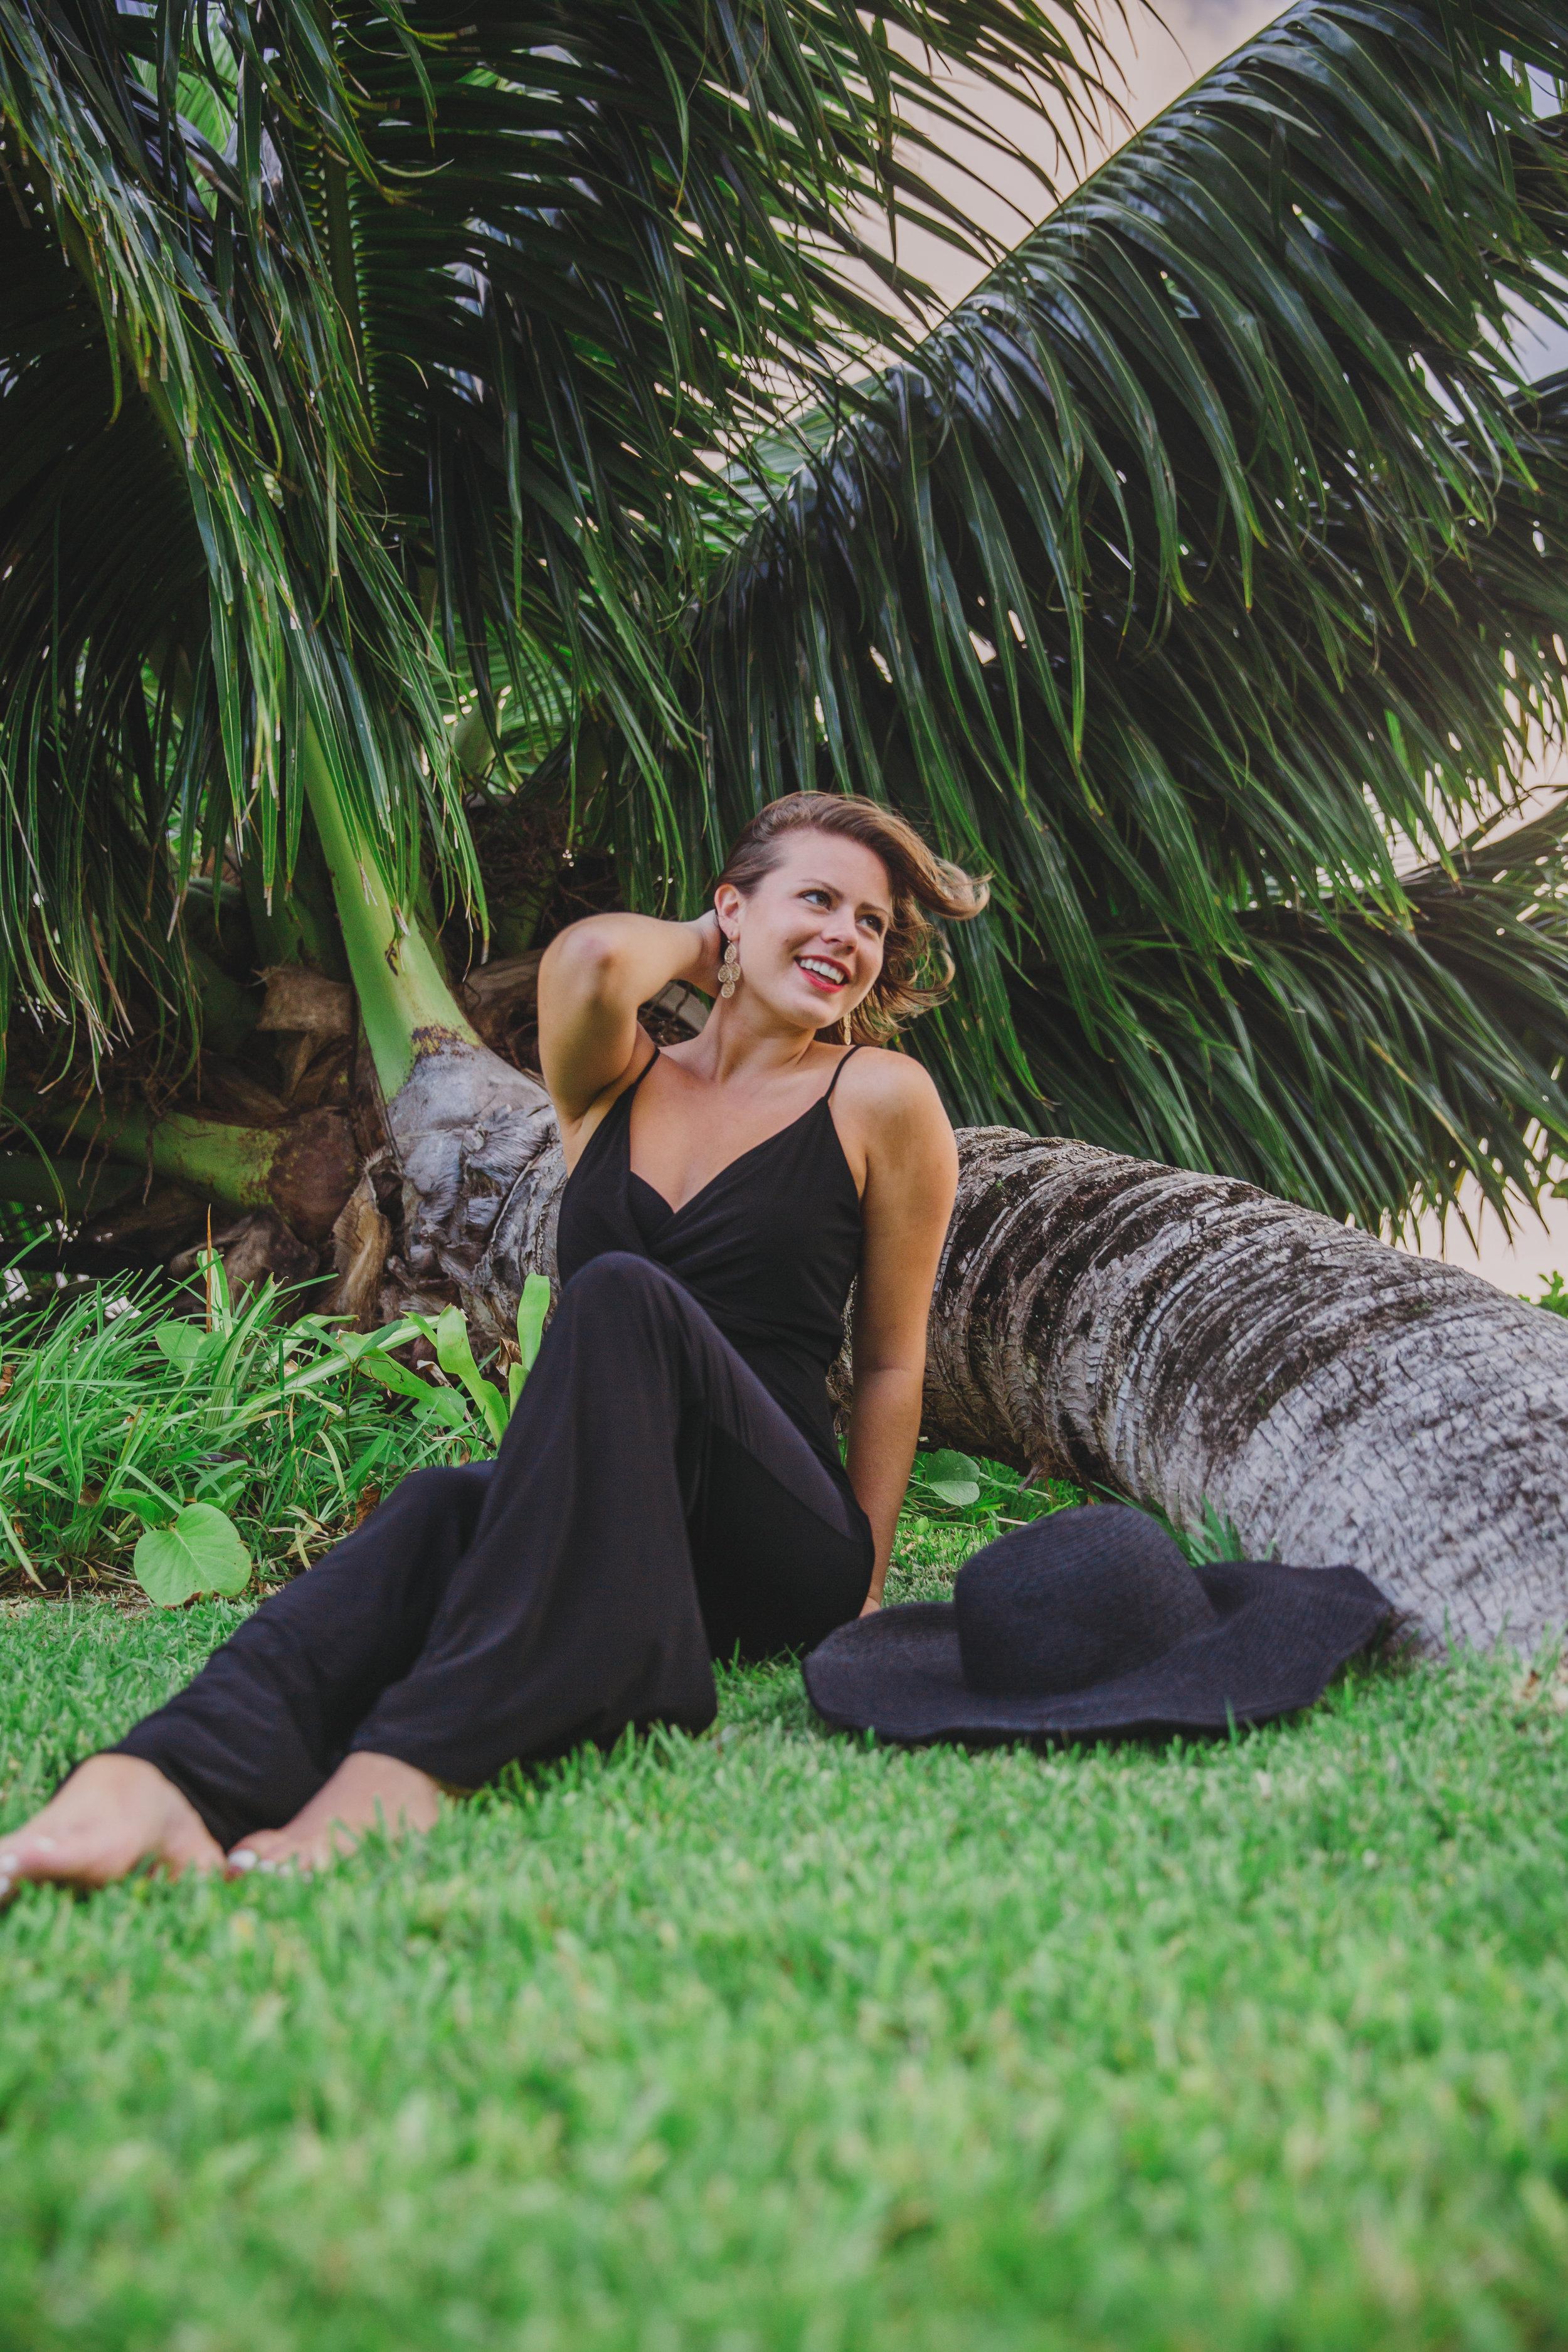 Hawai'i photographer, Oahu photographer, honolulu photographer, genkiphotos, genkimedia, senior portraits, Hawaii graduation Photography, Hawaii graduation, Hawaii senior, Hawaii Sunset